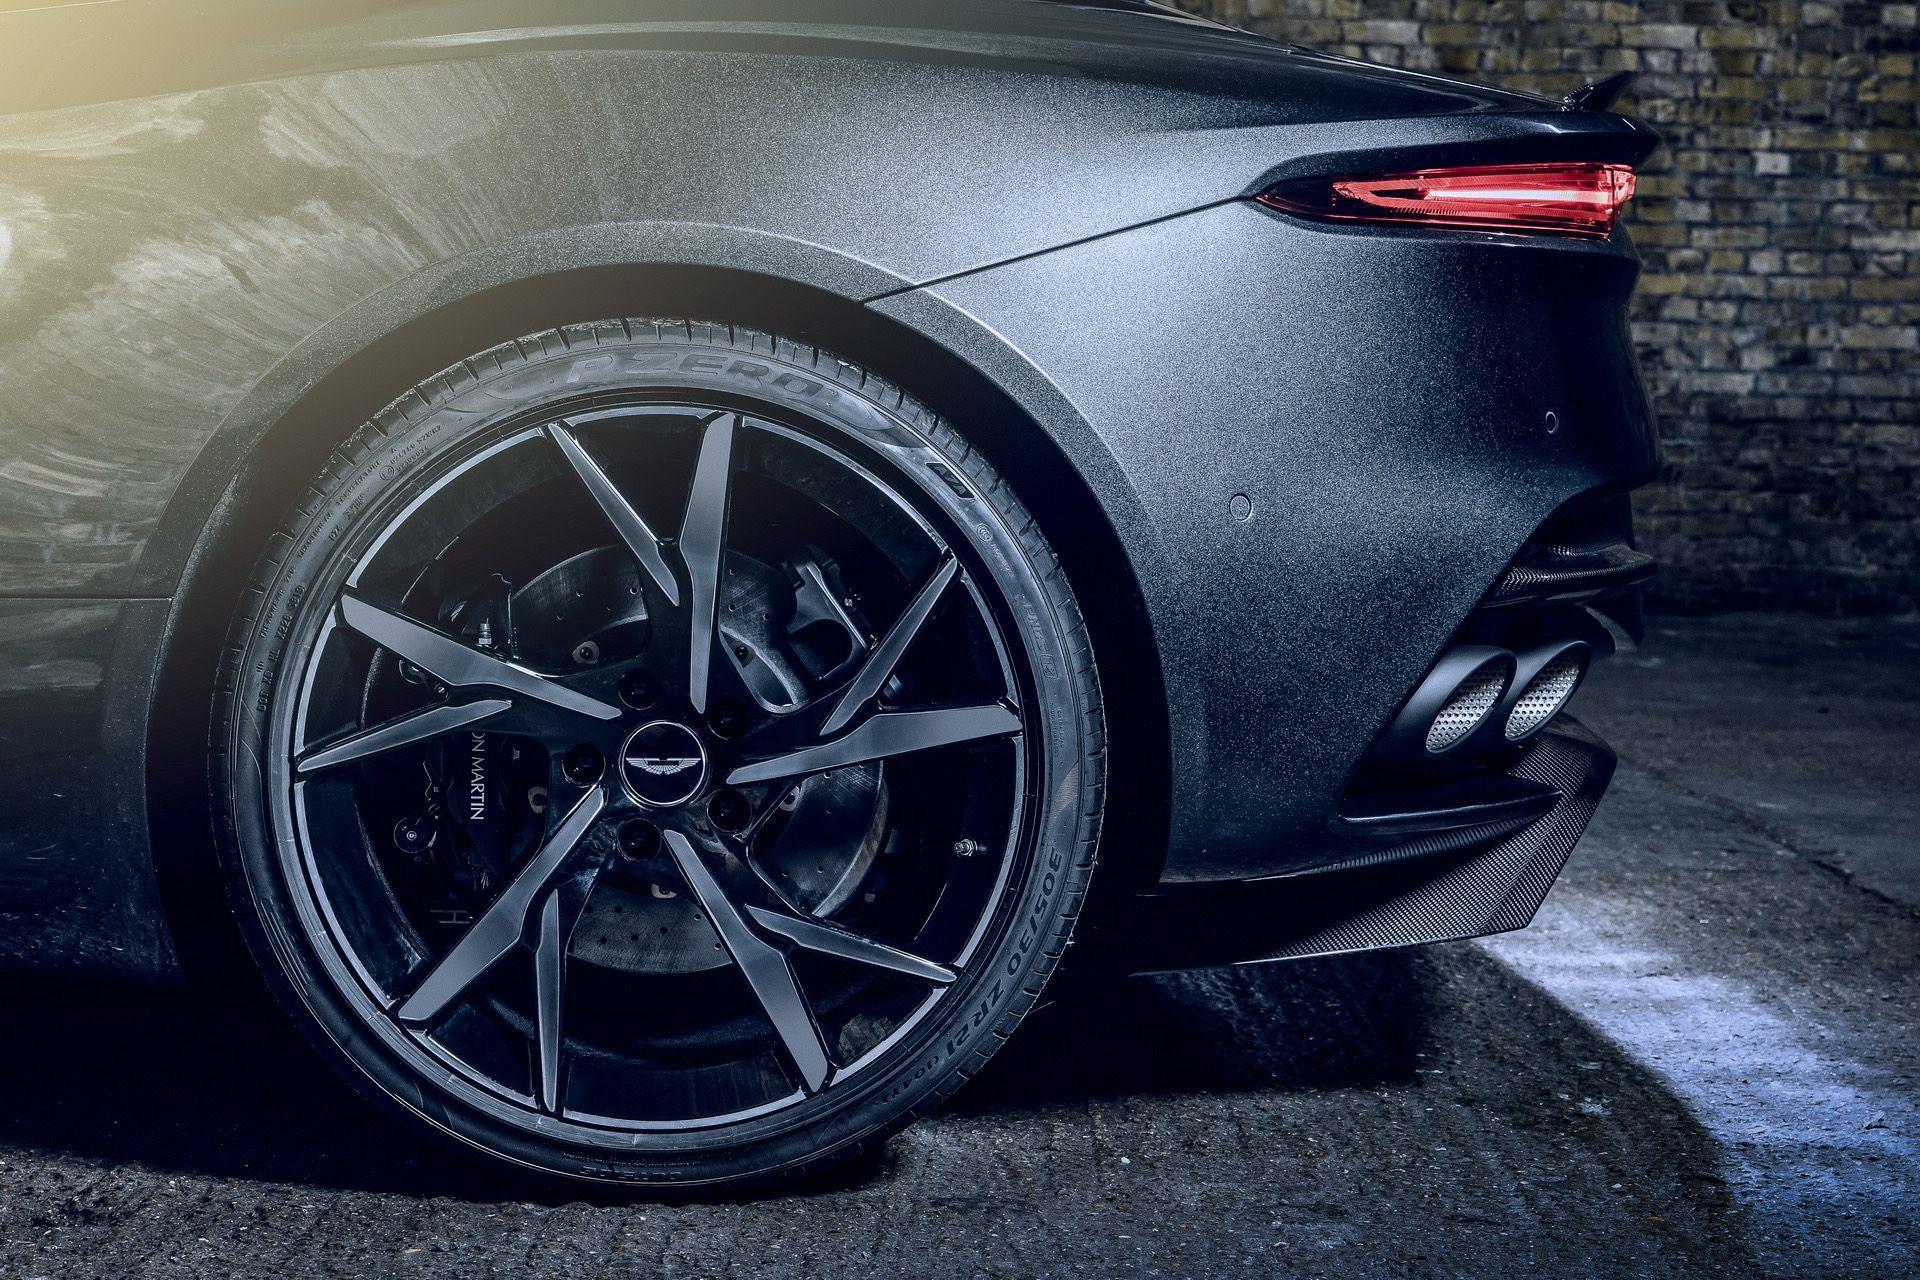 2021-aston-martin-dbs-superleggera-007-edition-7